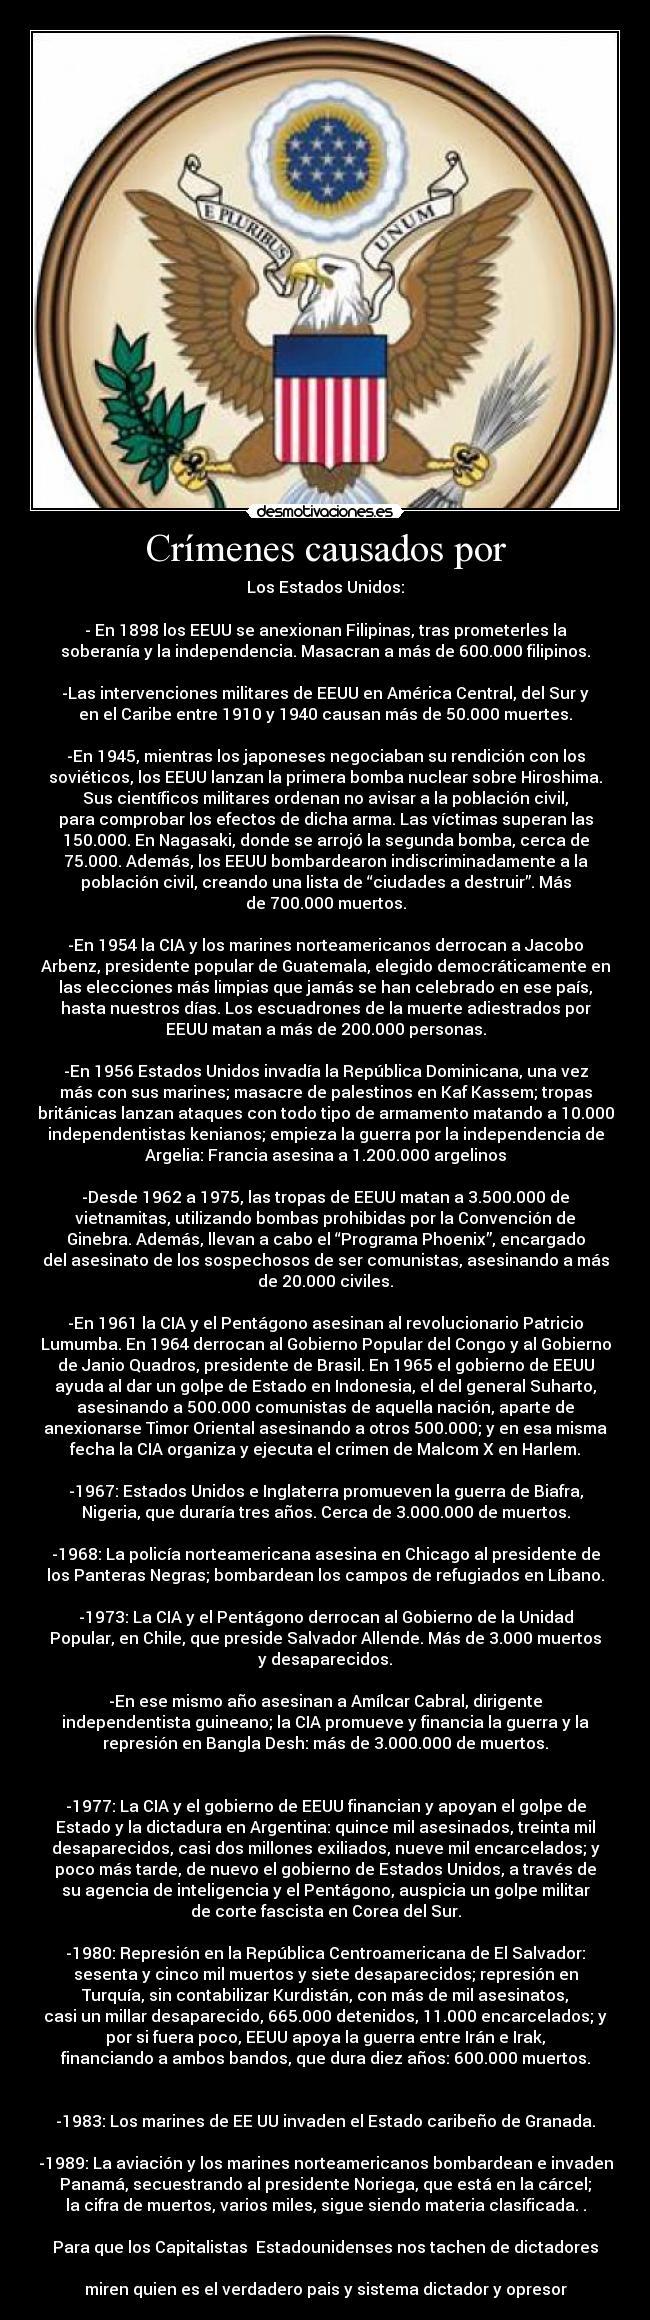 historia bancaria salvador desde 1980 hasta fecha: